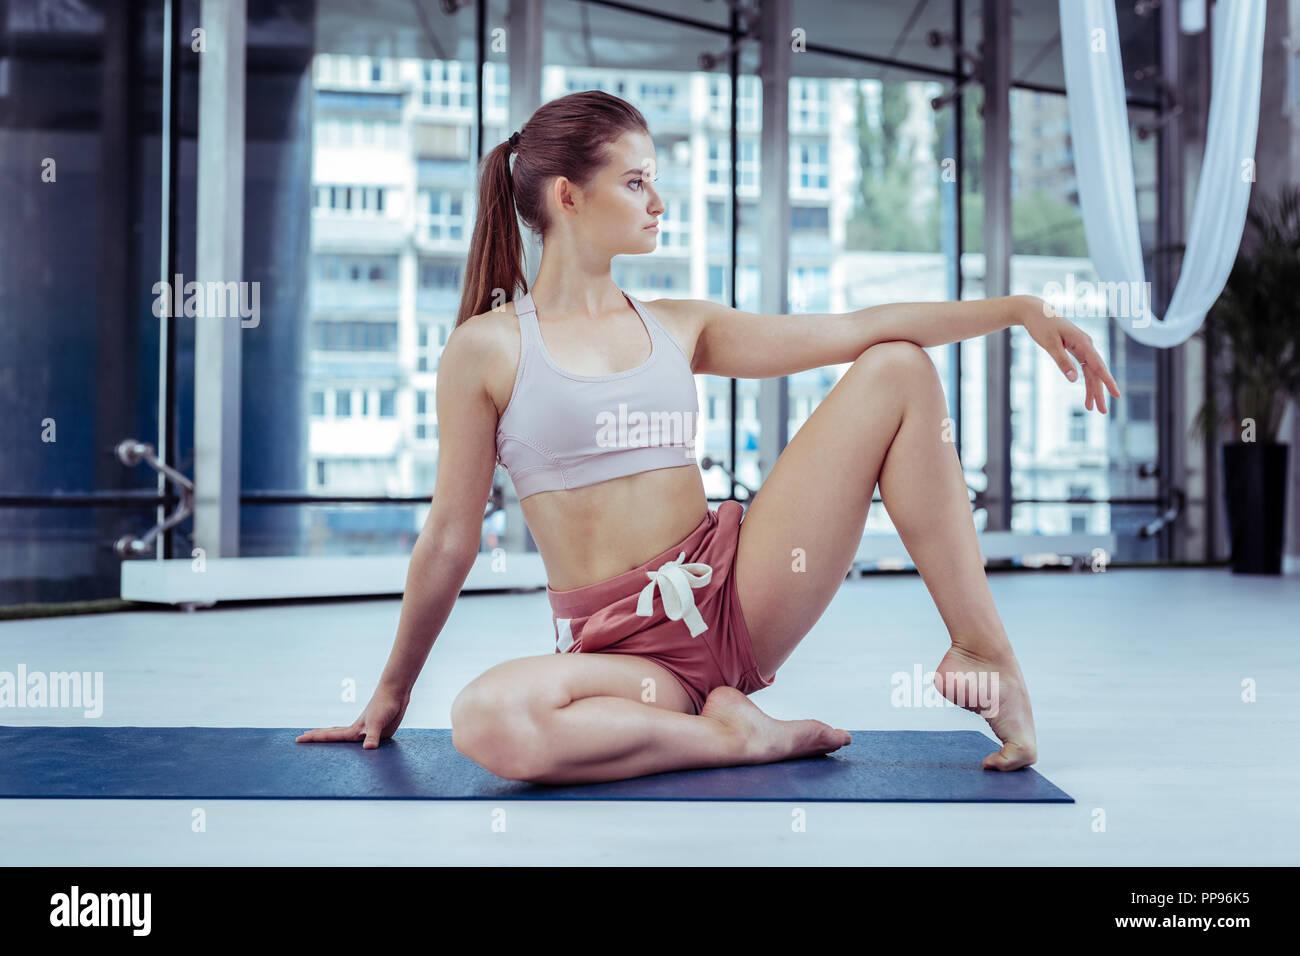 Earnest sportive woman training her acrobatic skills - Stock Image